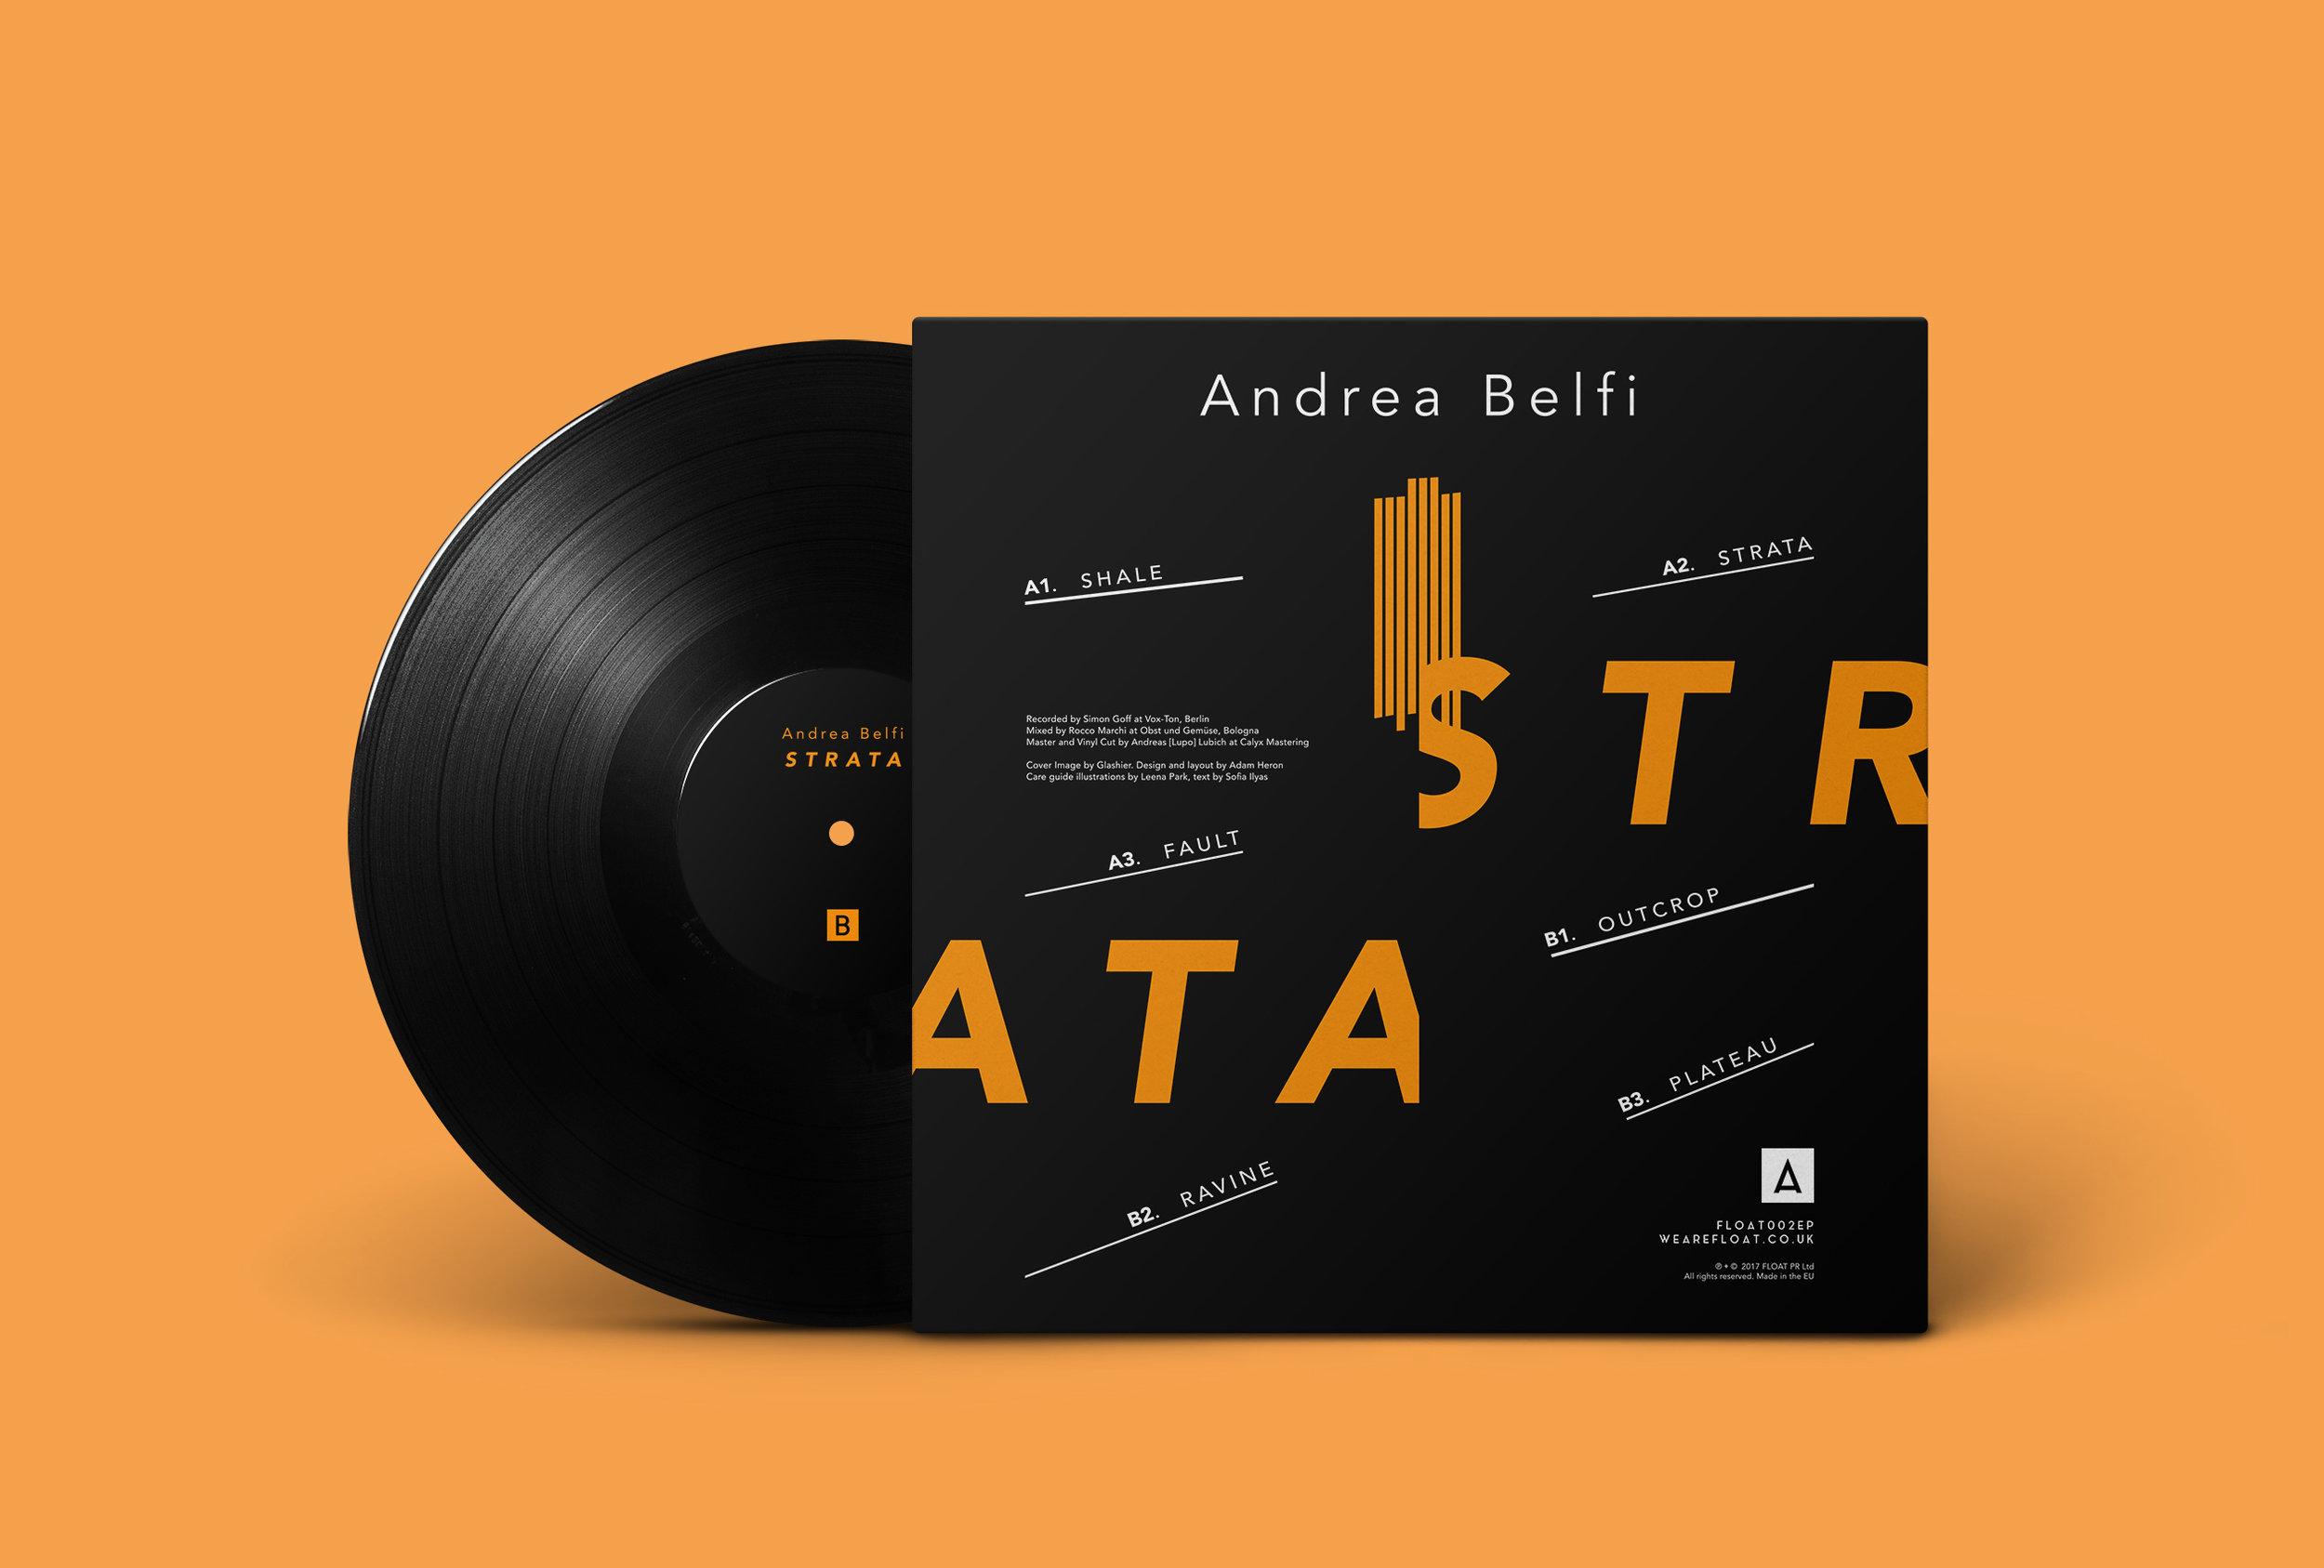 Andrea-Belfi_STRATA_vinyl-mock-up_BACK_with vinyl.jpg